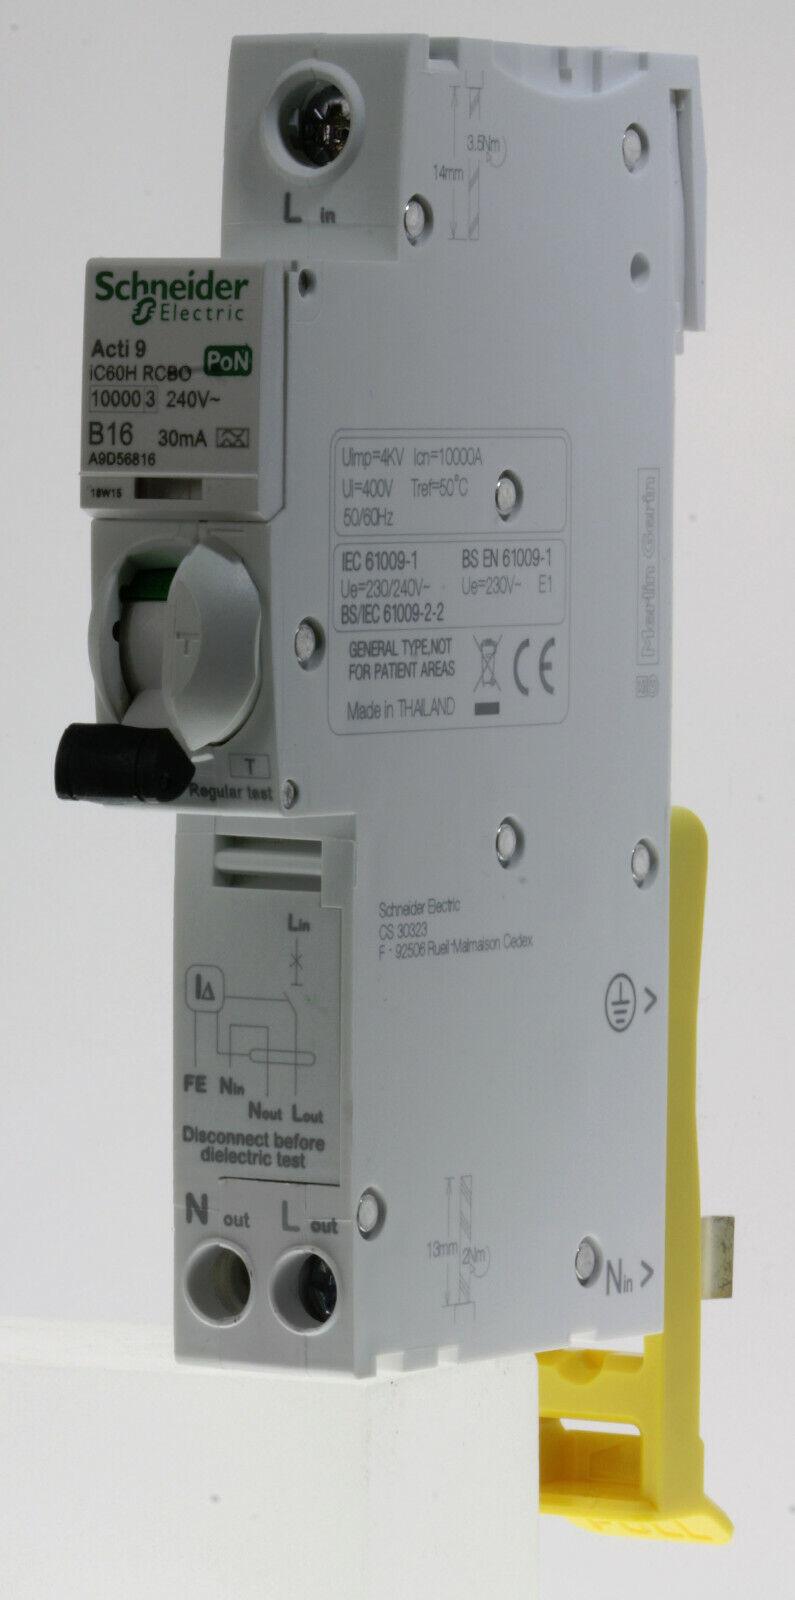 Schneider Acti 9 - A9D56816 - 16a 30mA Type B Single Pole + Ns Type A RCBO PoN